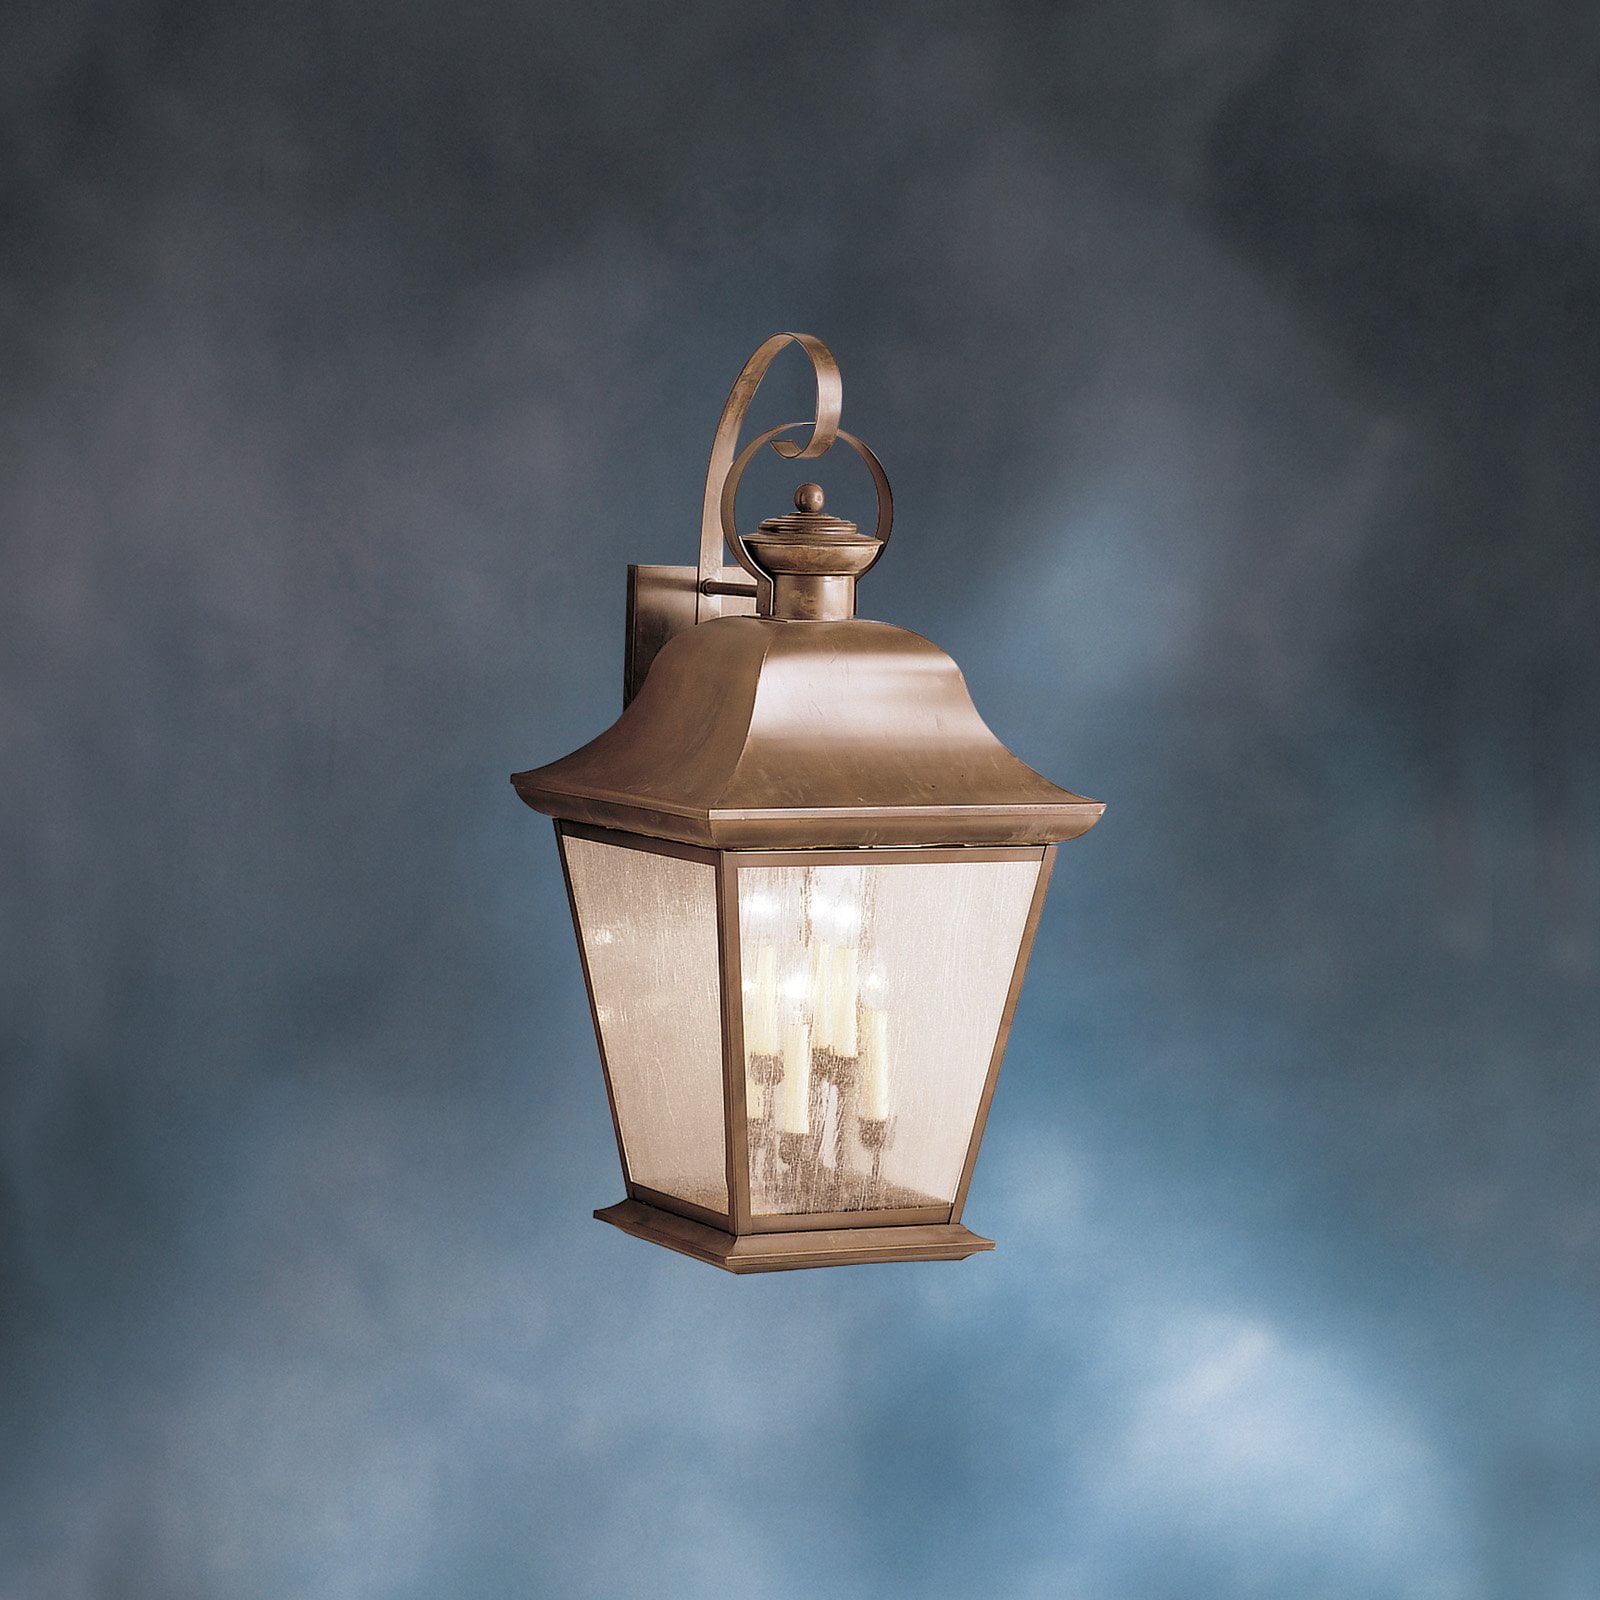 Kichler Mount Vernon 9703 Outdoor Wall Lantern - 16 in.